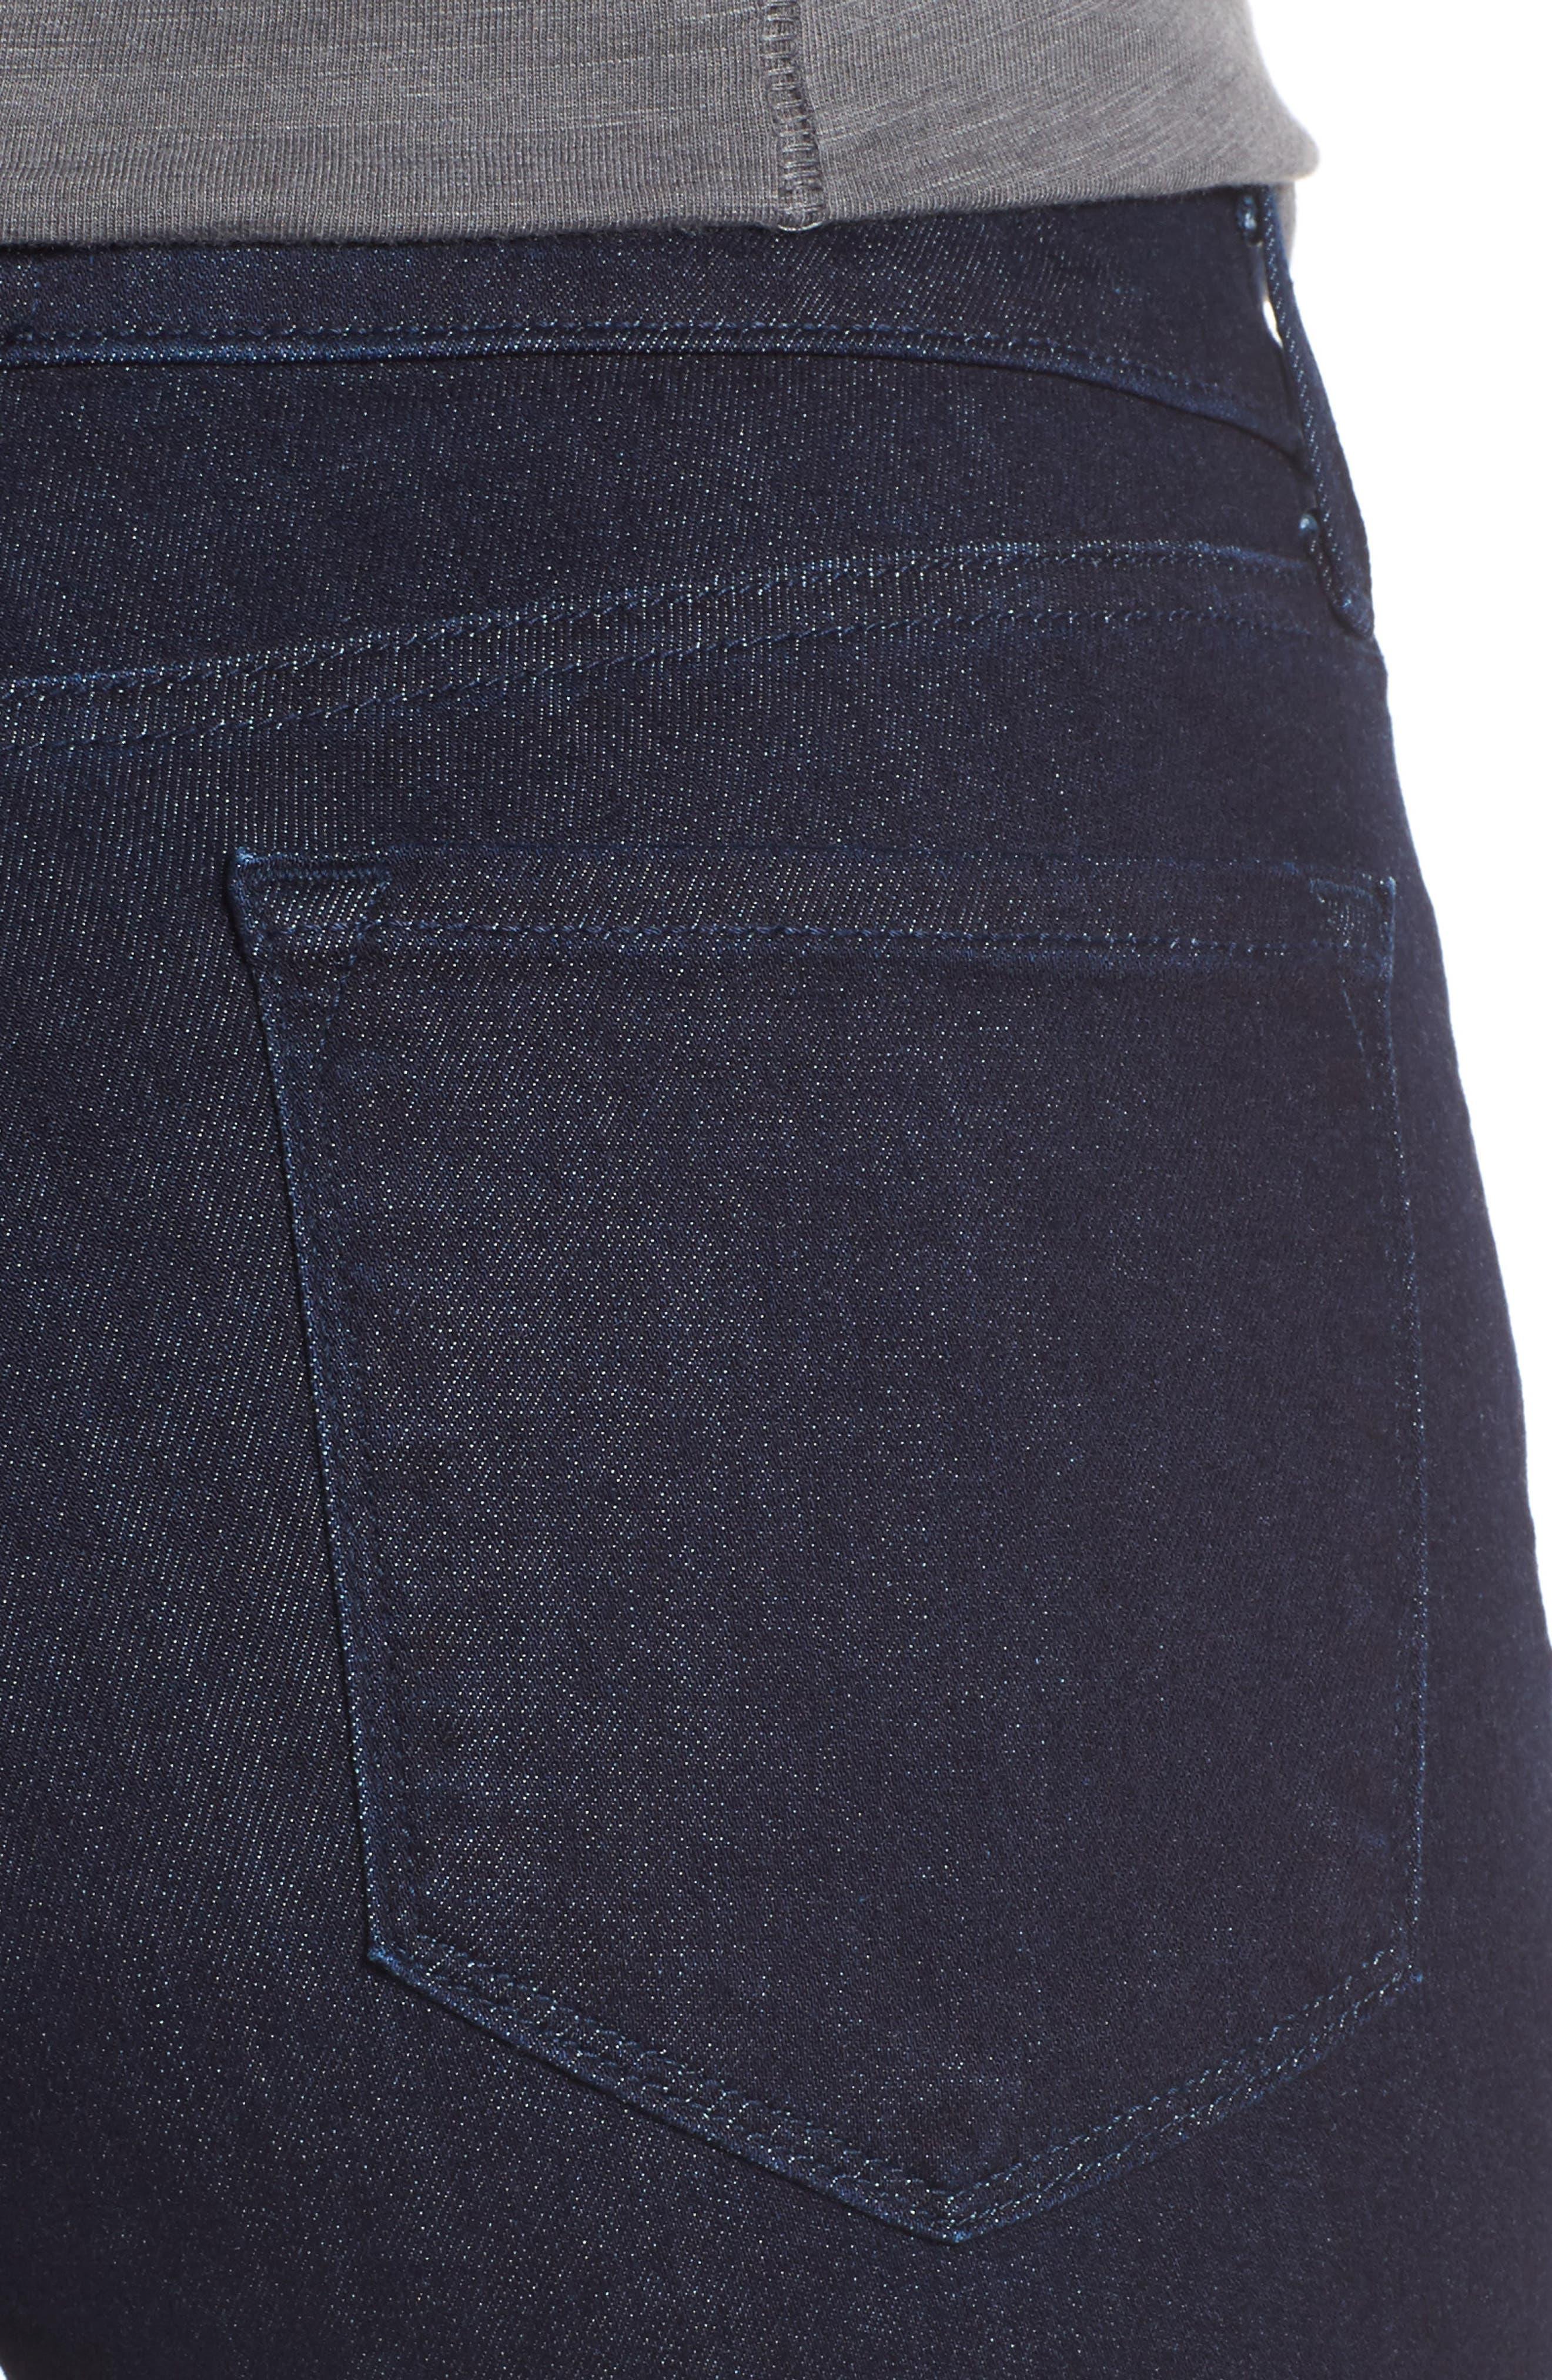 Marilyn Straight Leg Jeans,                             Alternate thumbnail 4, color,                             Rinse